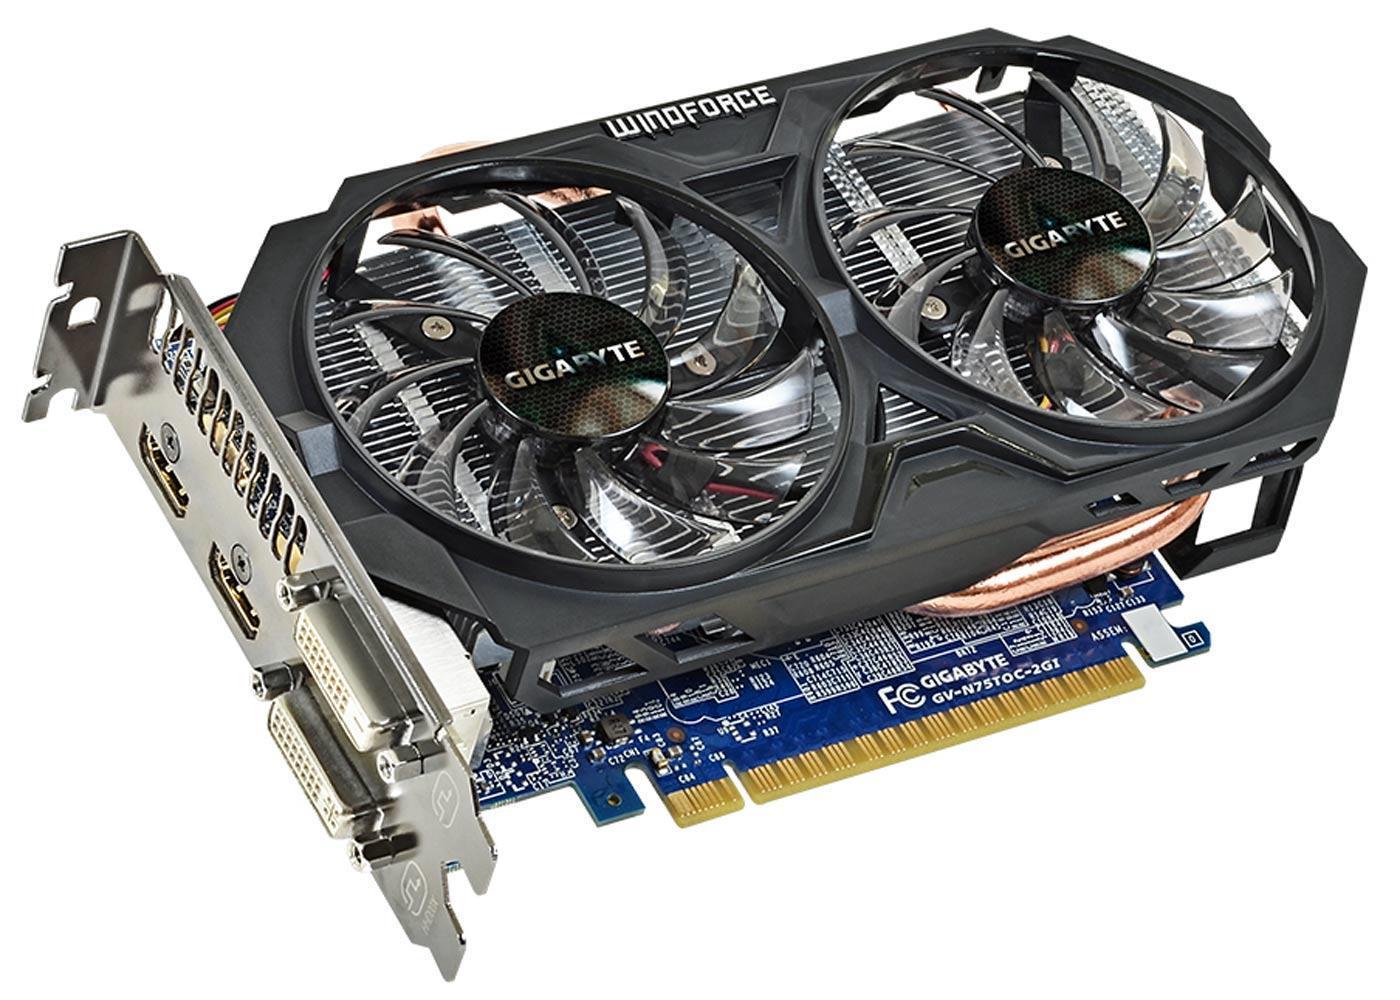 gigabyte Geforce GTX 750TI OC 2GB